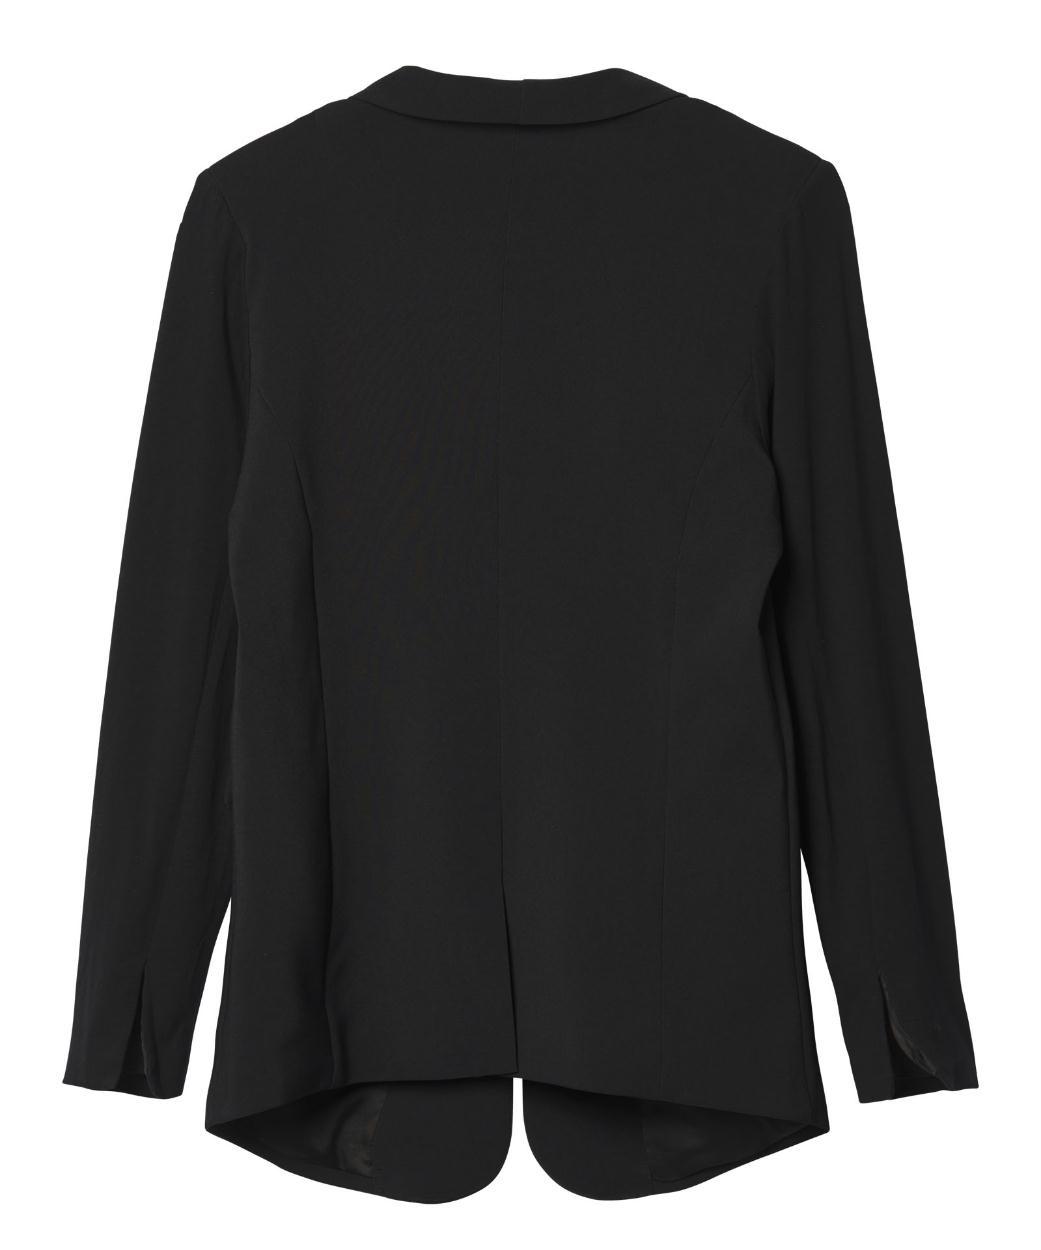 10Days Black Blazer 20.506.9103